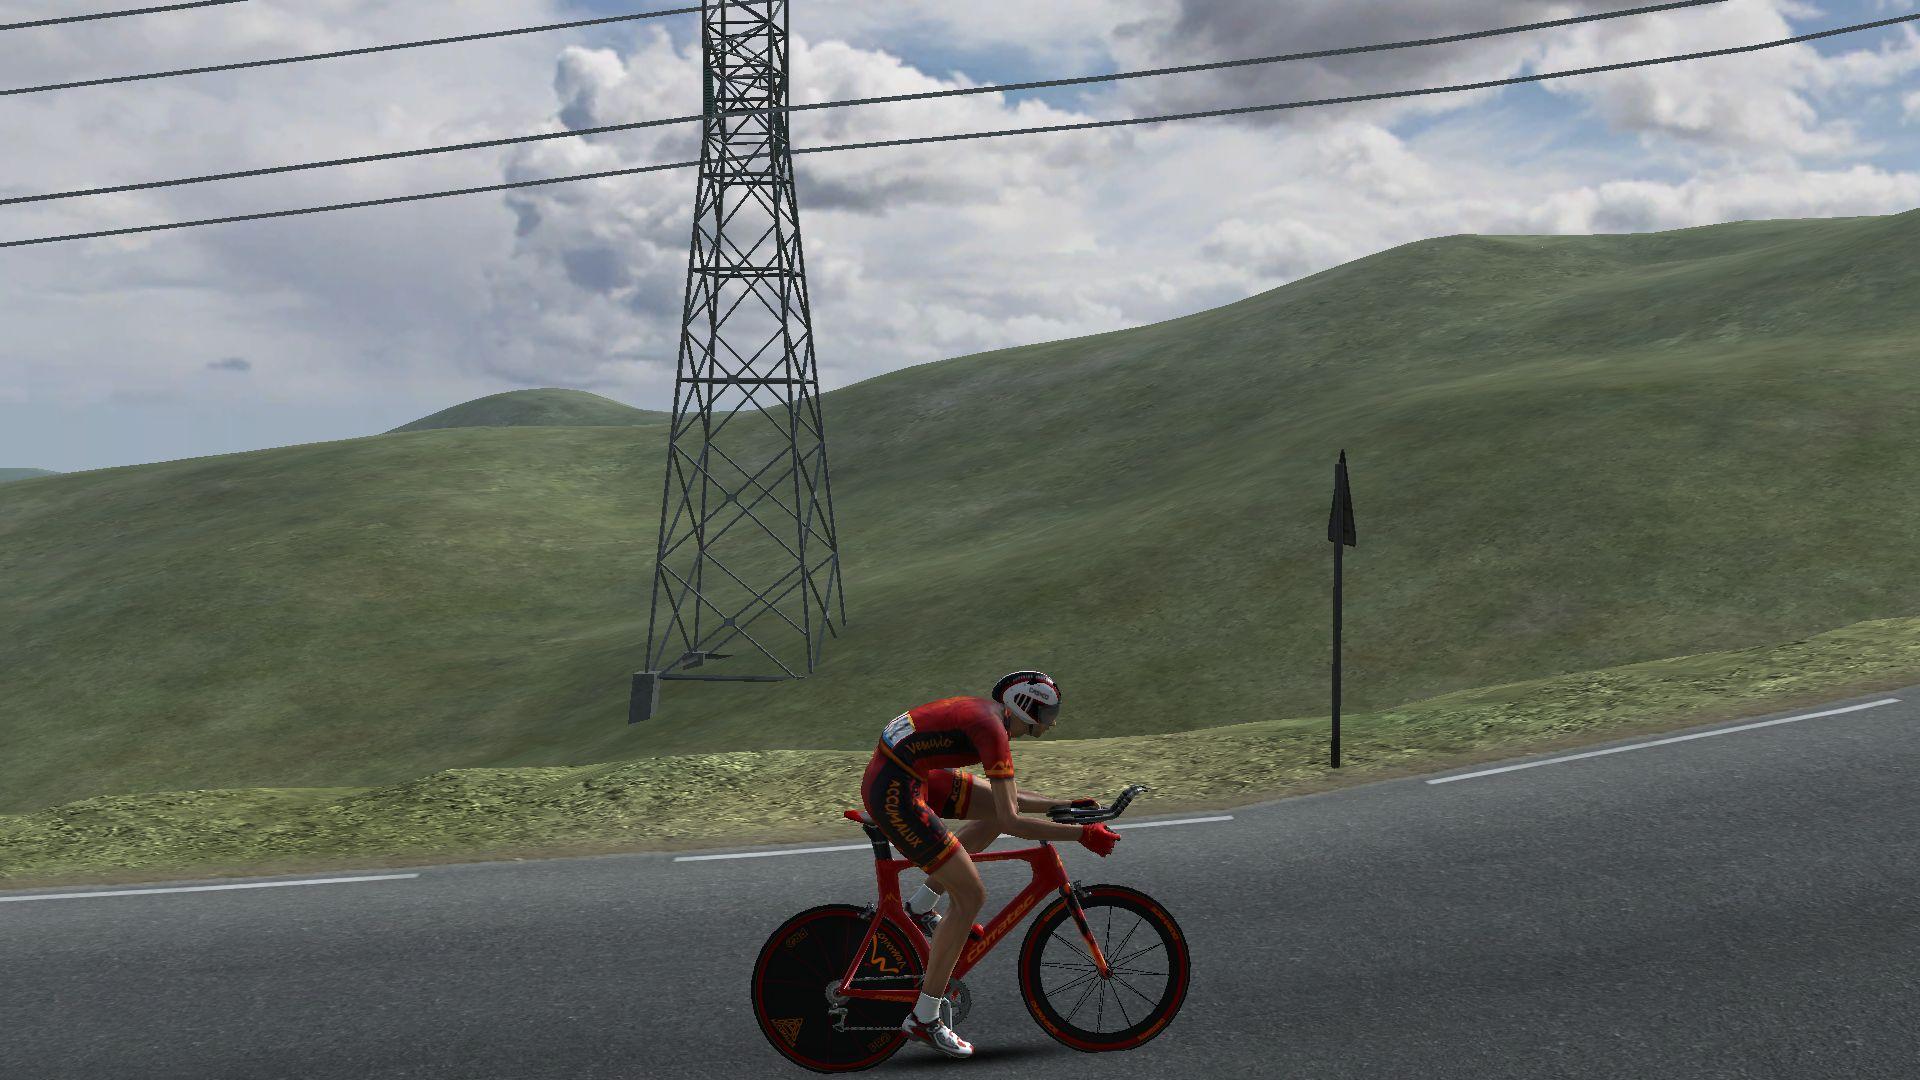 pcmdaily.com/images/mg/2019/Races/GTM/Giro/mg19_giro_09_PCM0028.jpg